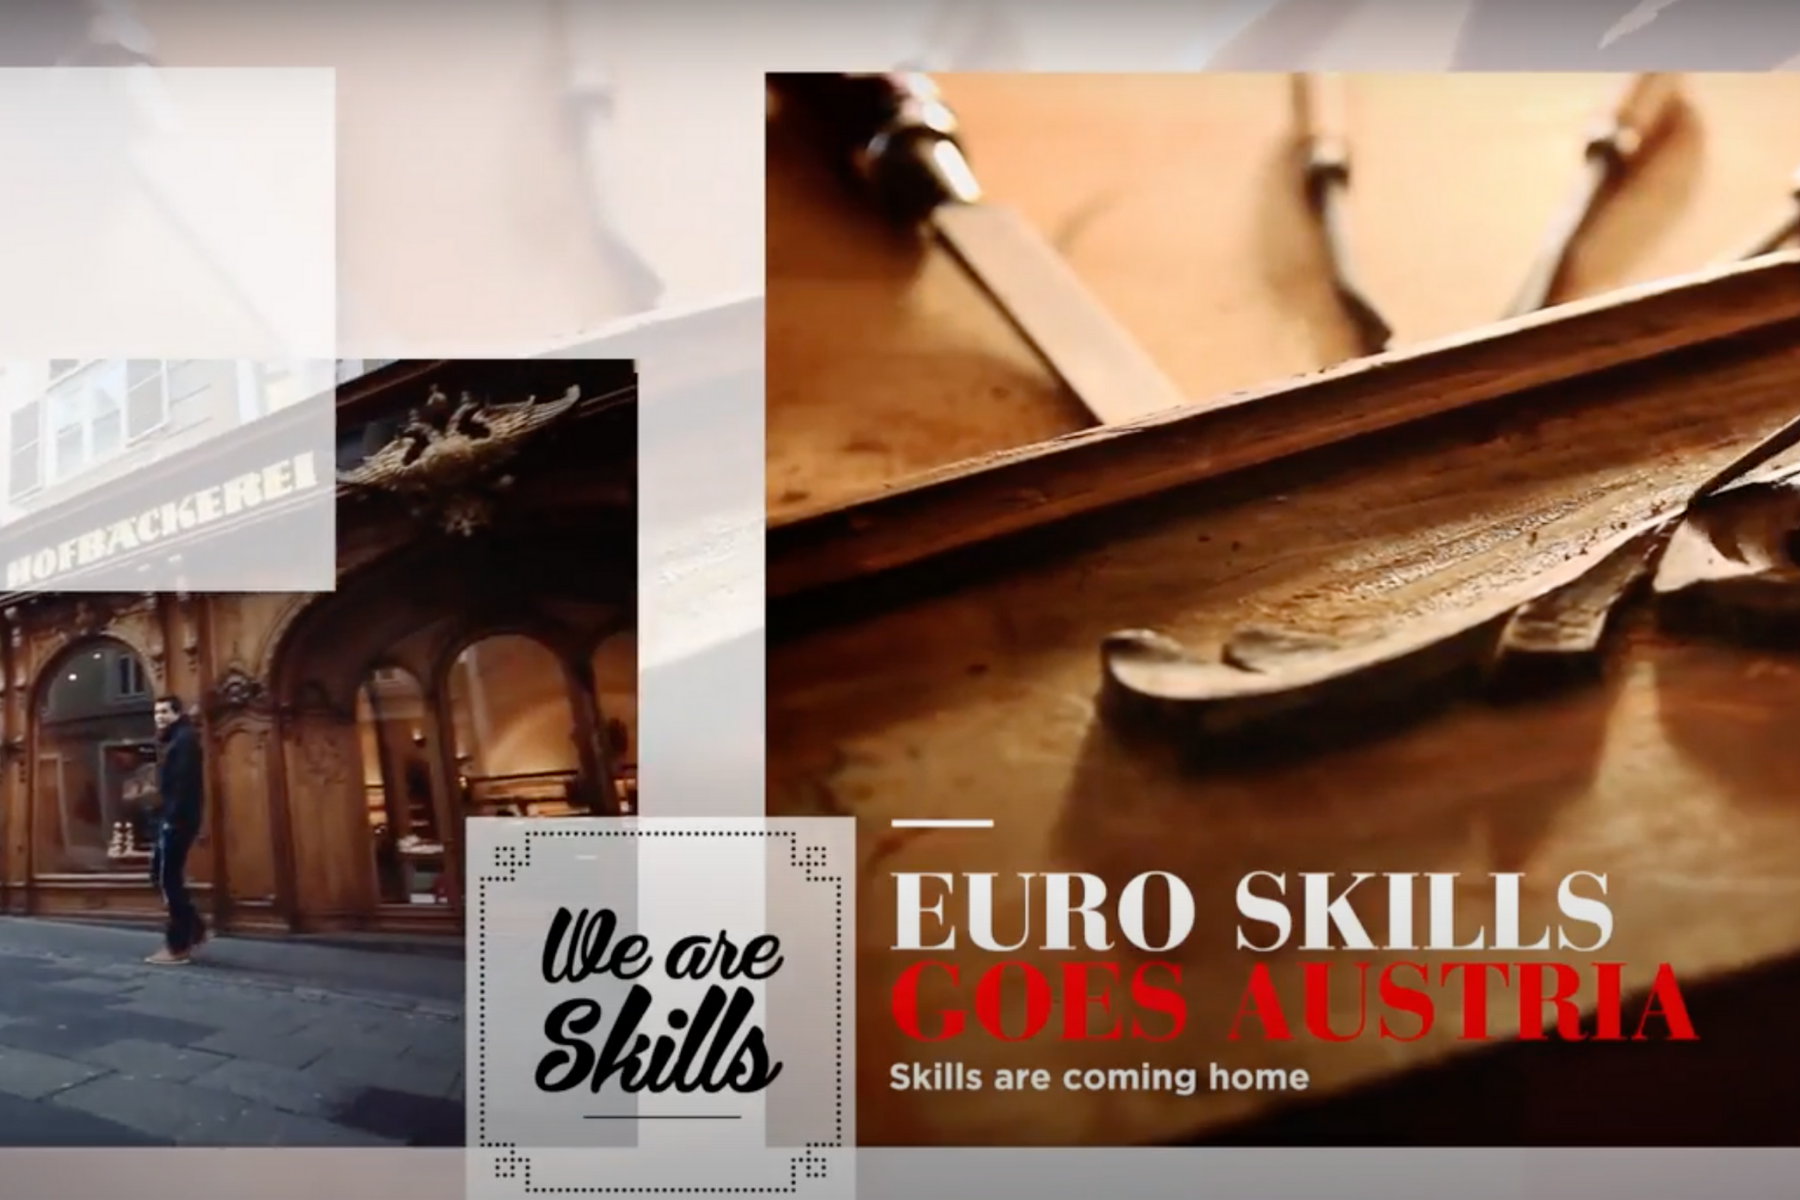 euro skills _salon deluxe ninapopp.com Referenzen